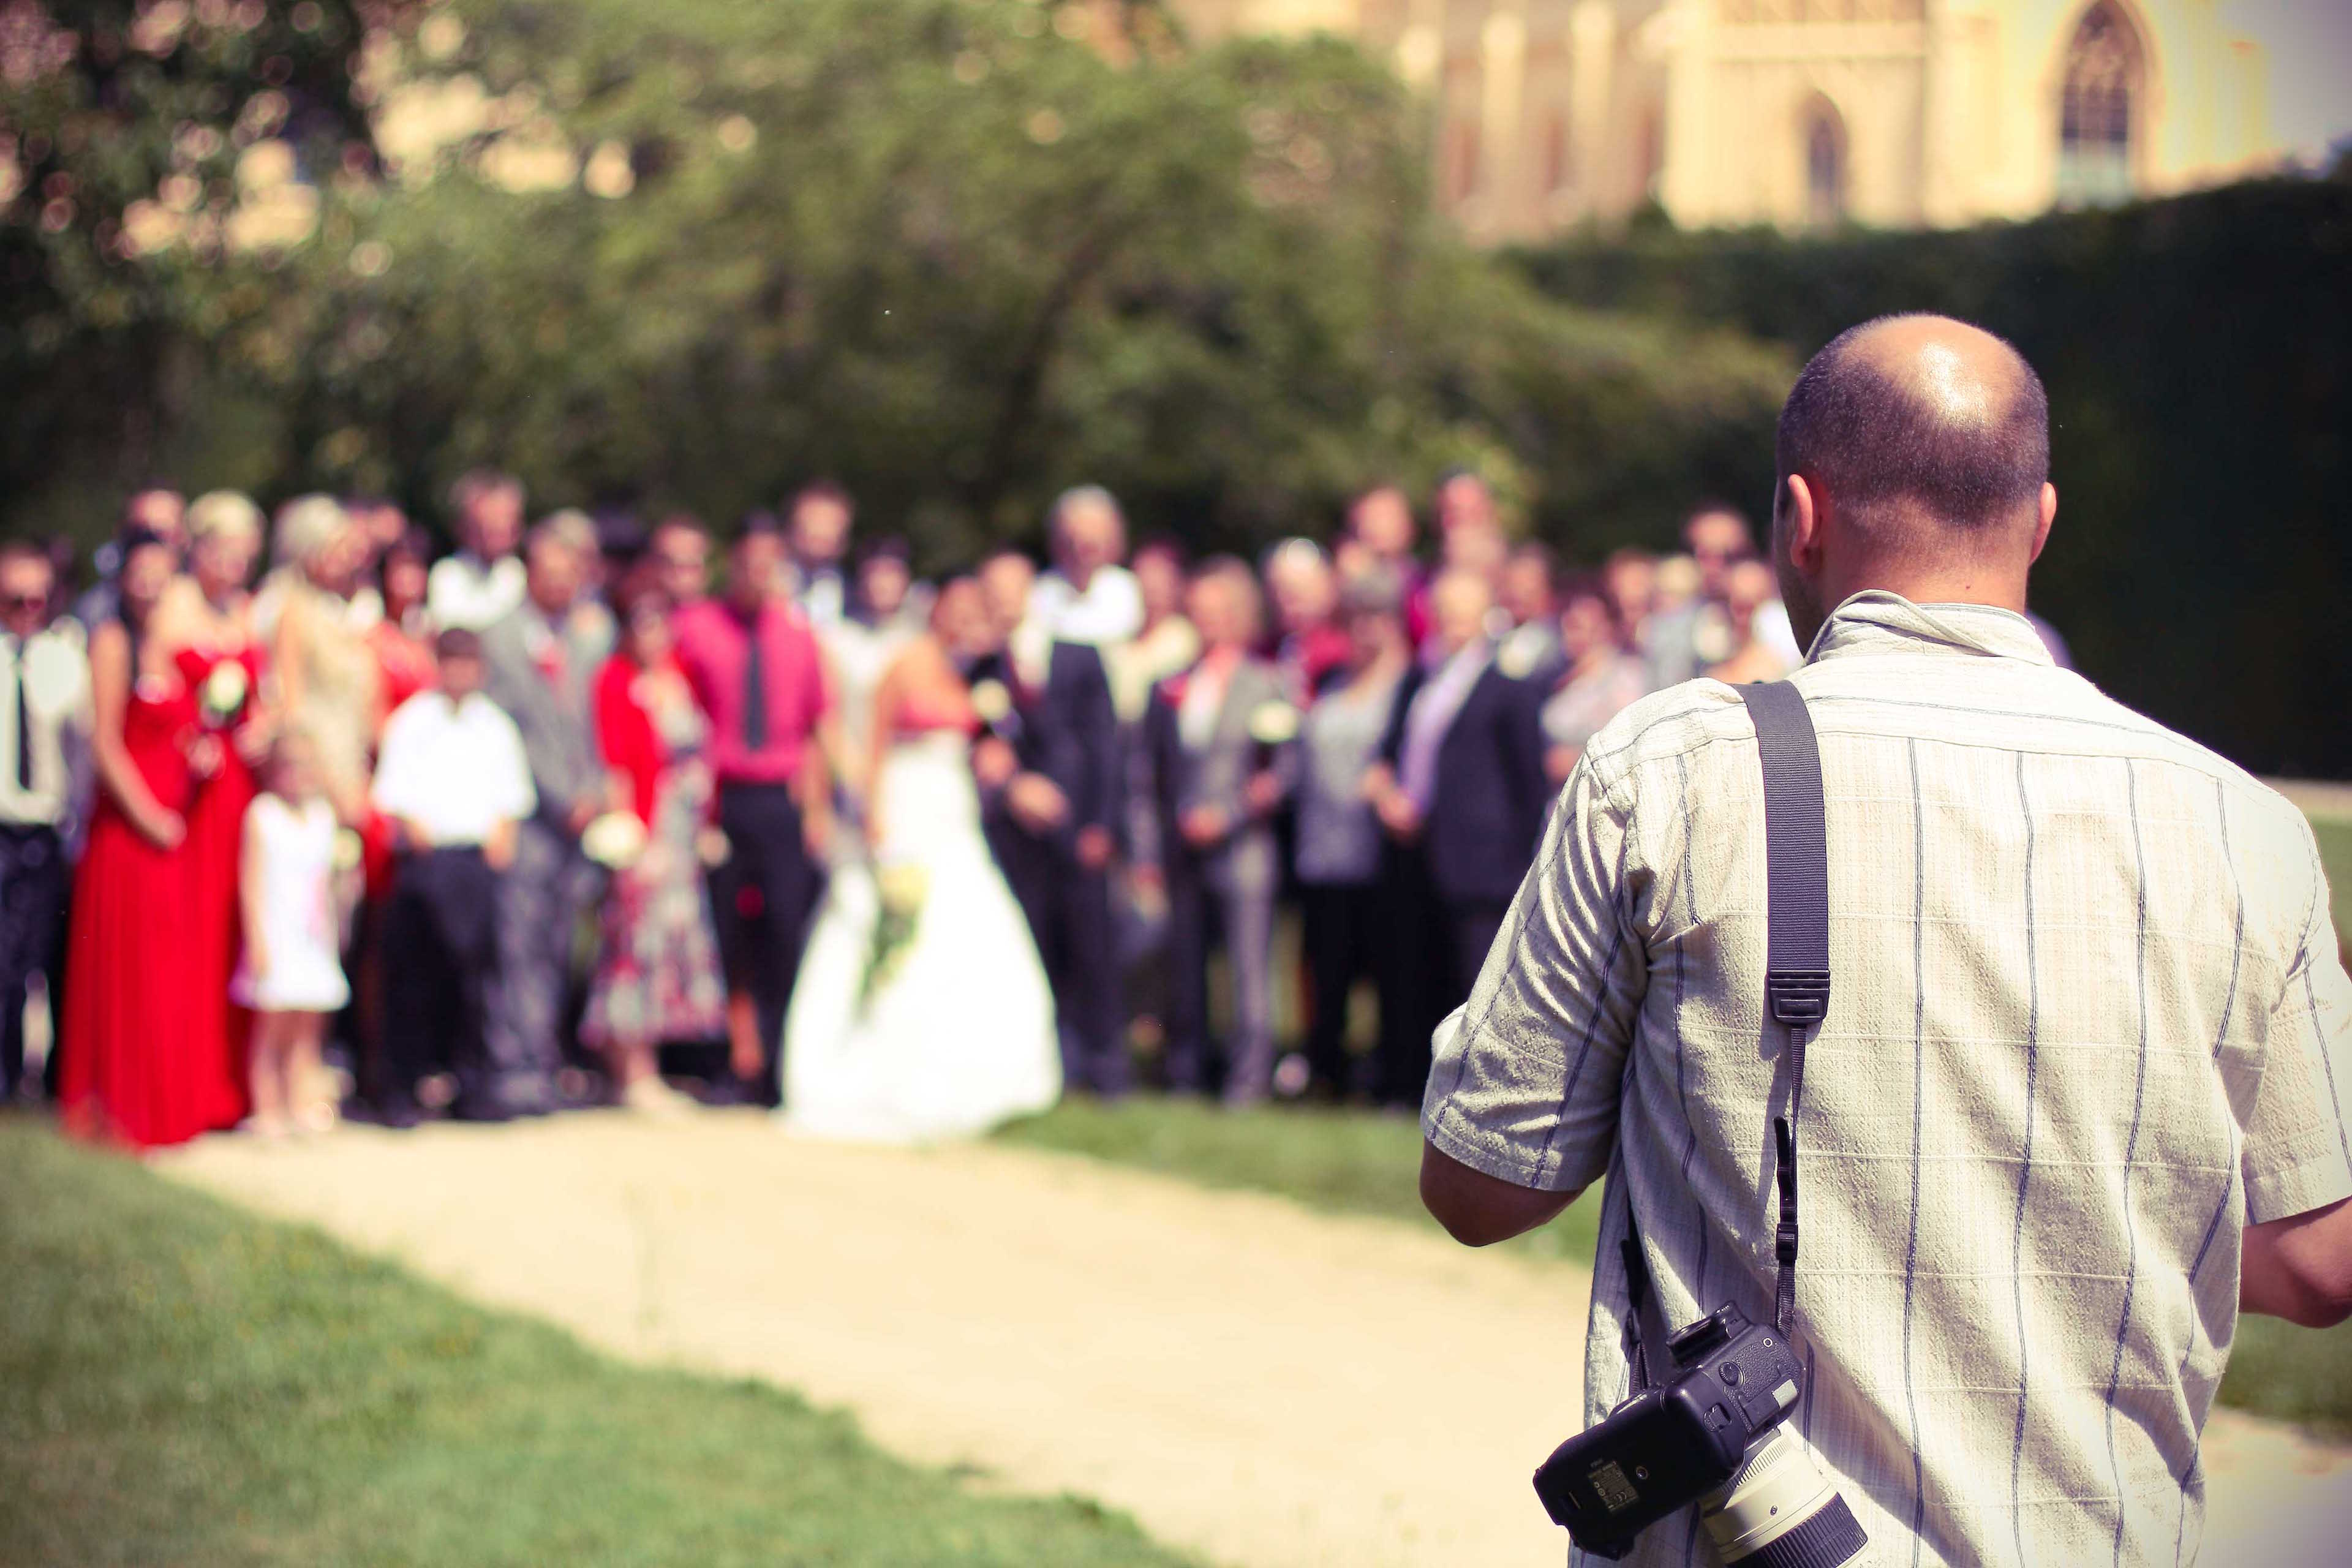 WEDDINGS, BAR & BAT MITZVAHS, & SWEET SIXTEENS